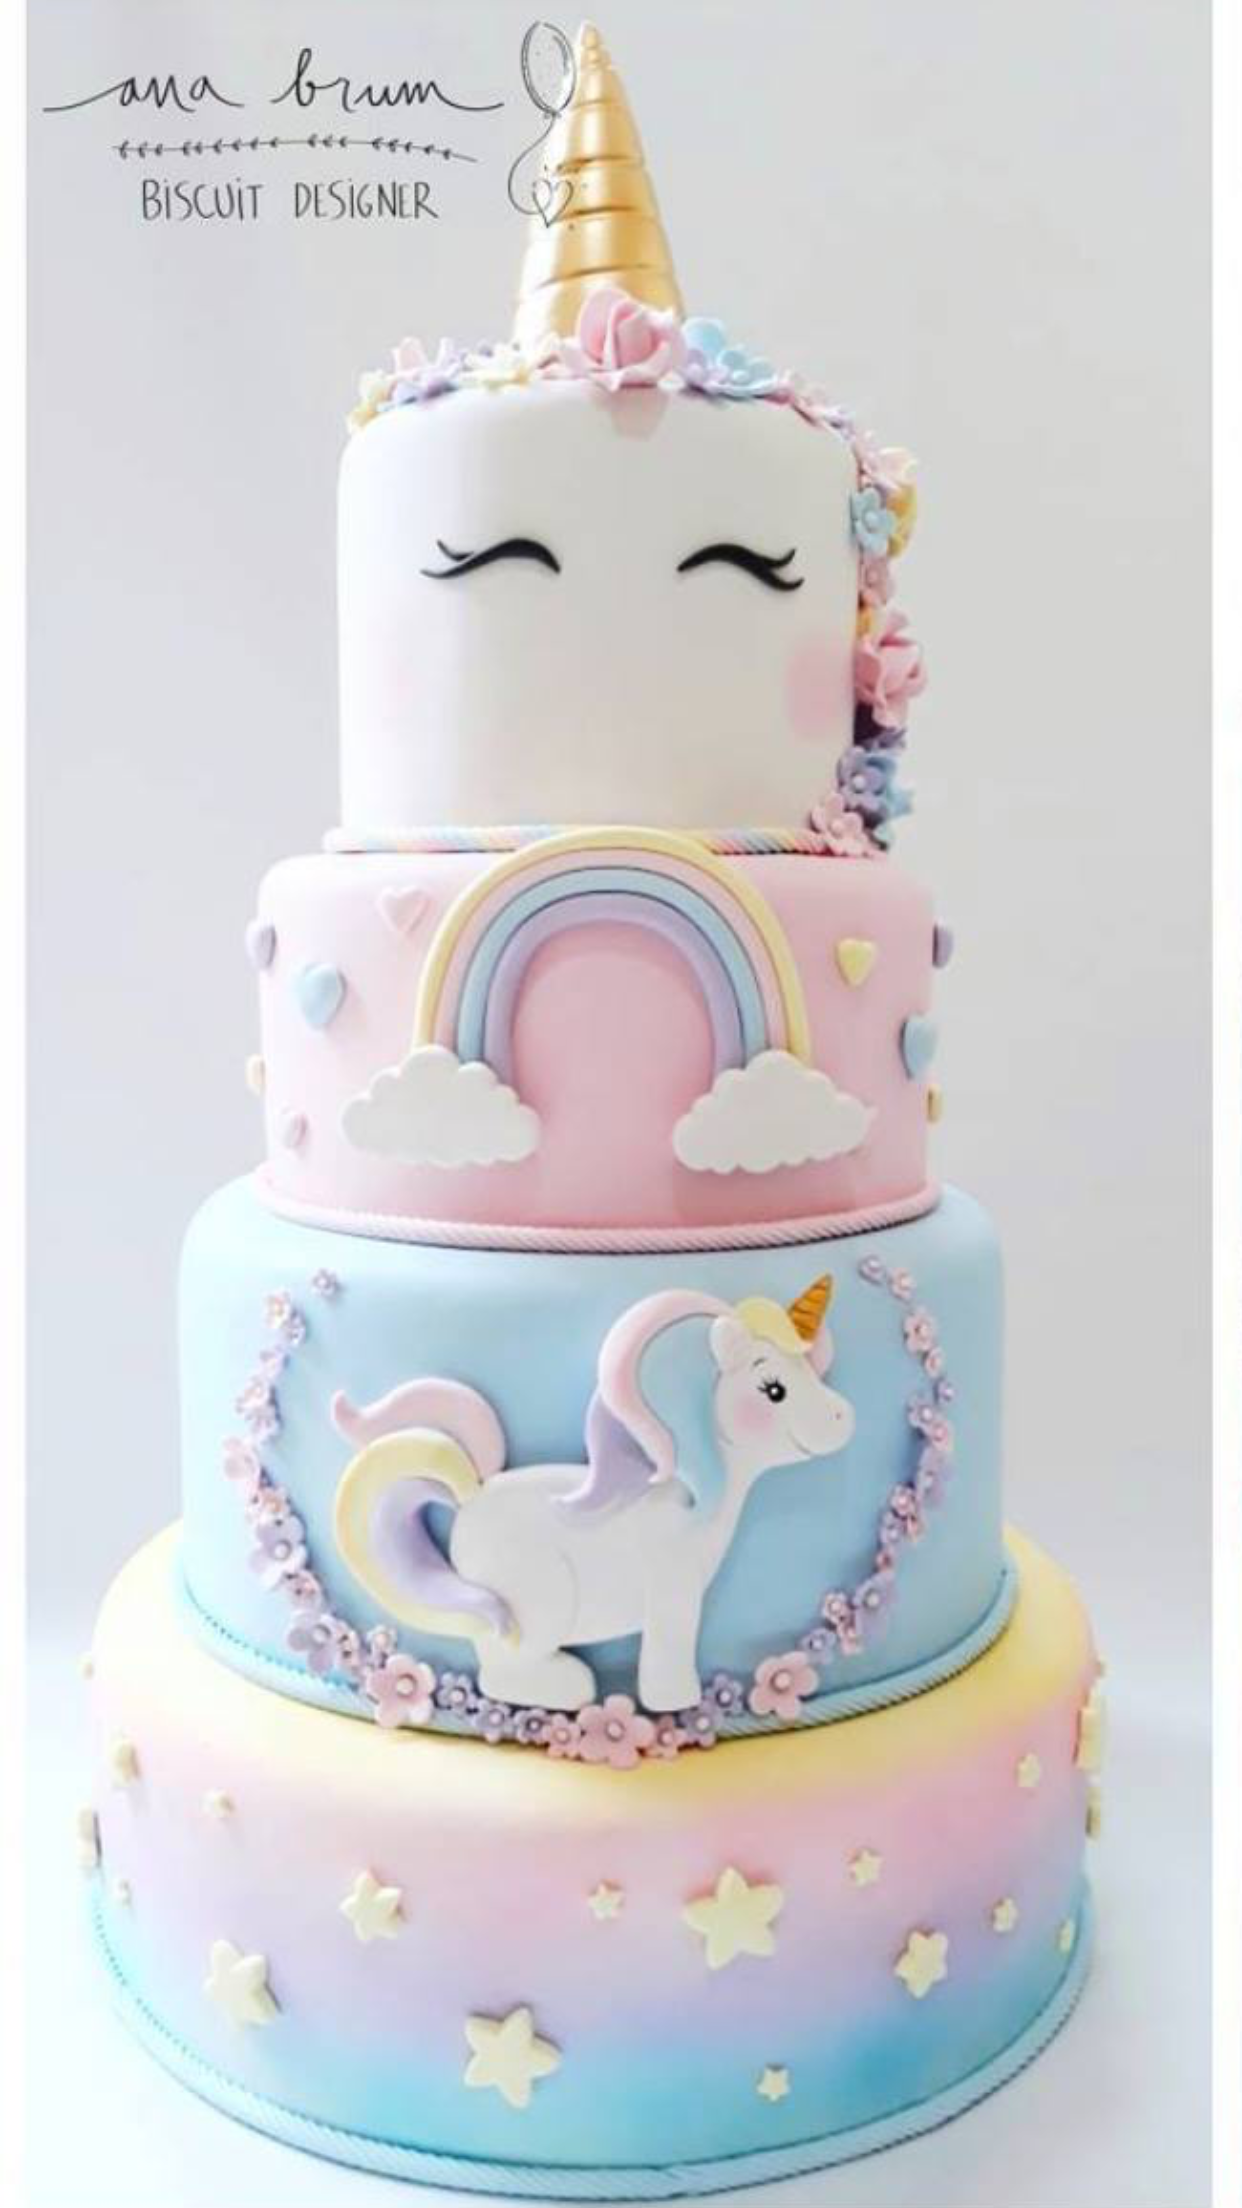 Awesome Unicorn And Rainbows Layered Birthday Cake Design Where Be